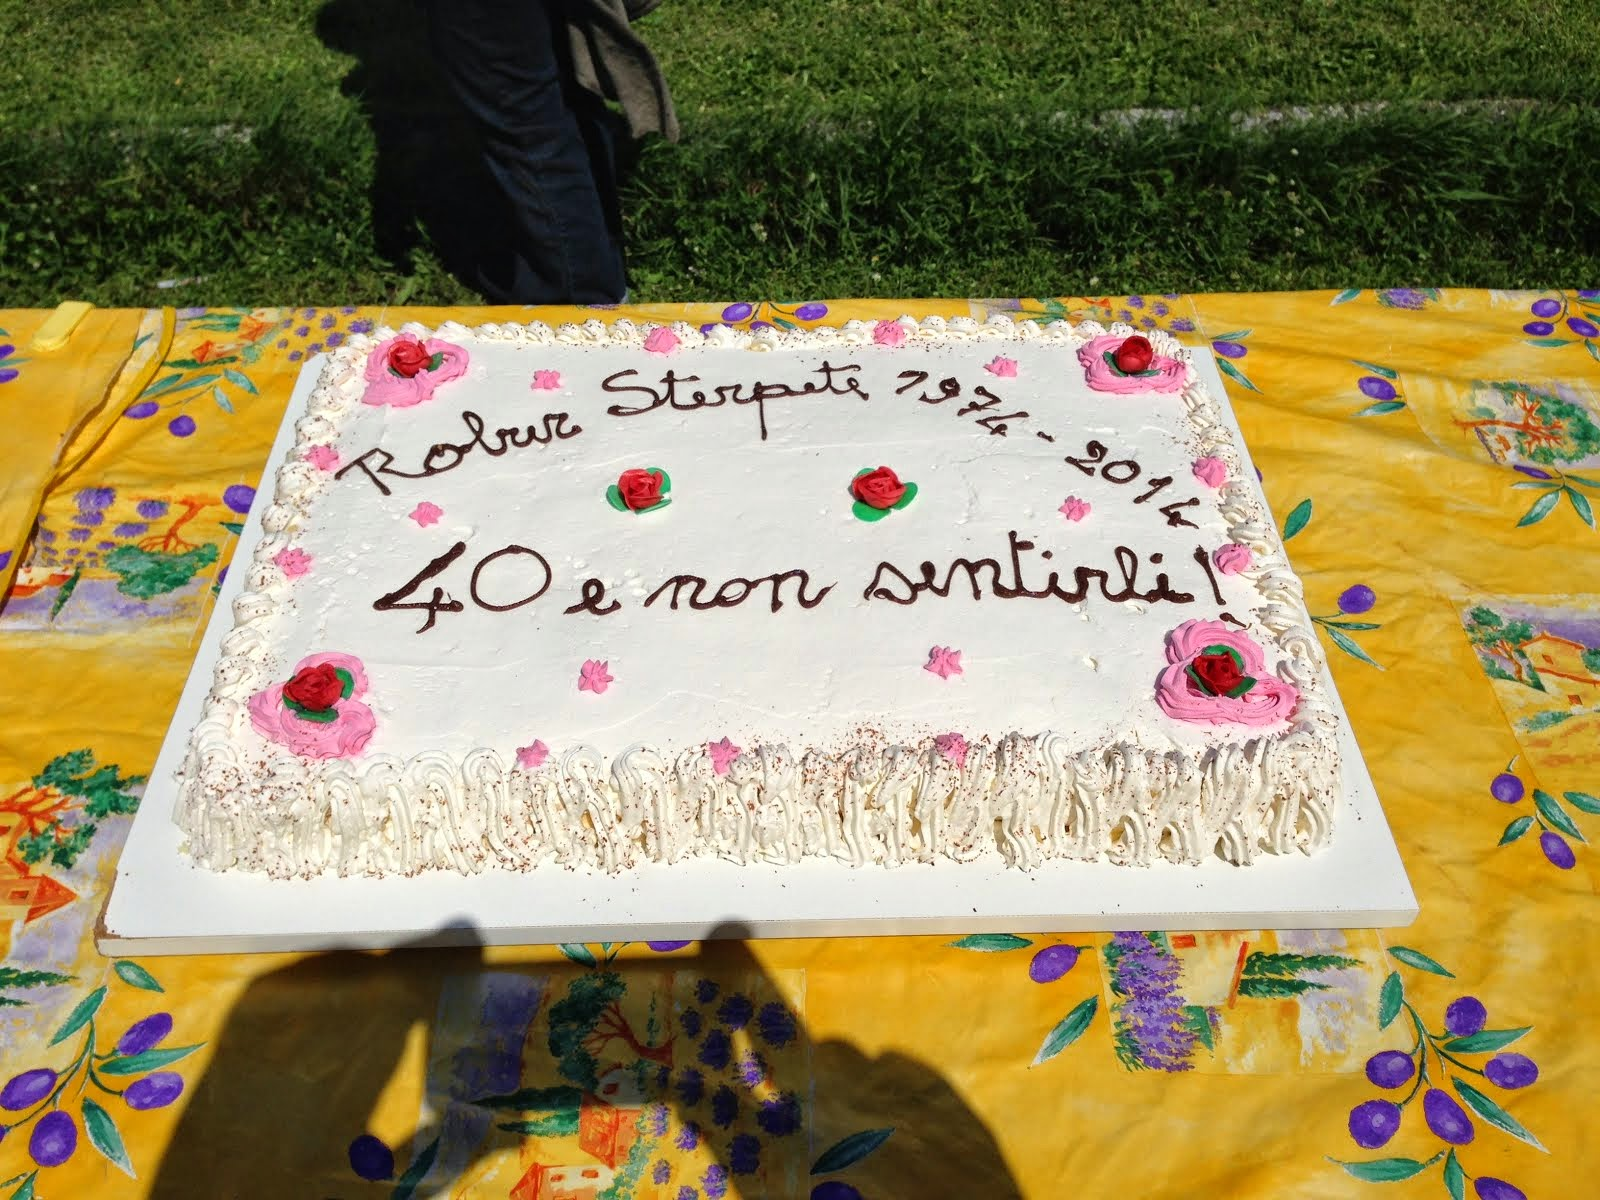 Robur Sterpete 1974-2014